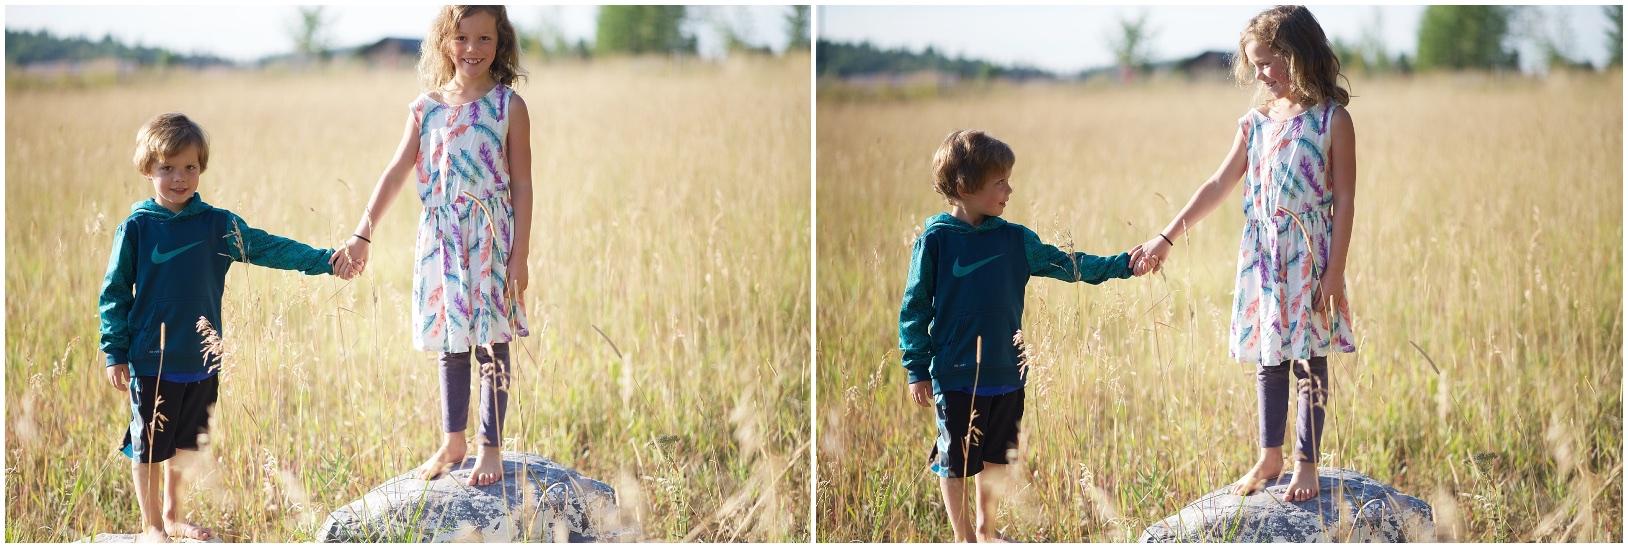 lindseyjane_kids013.jpg